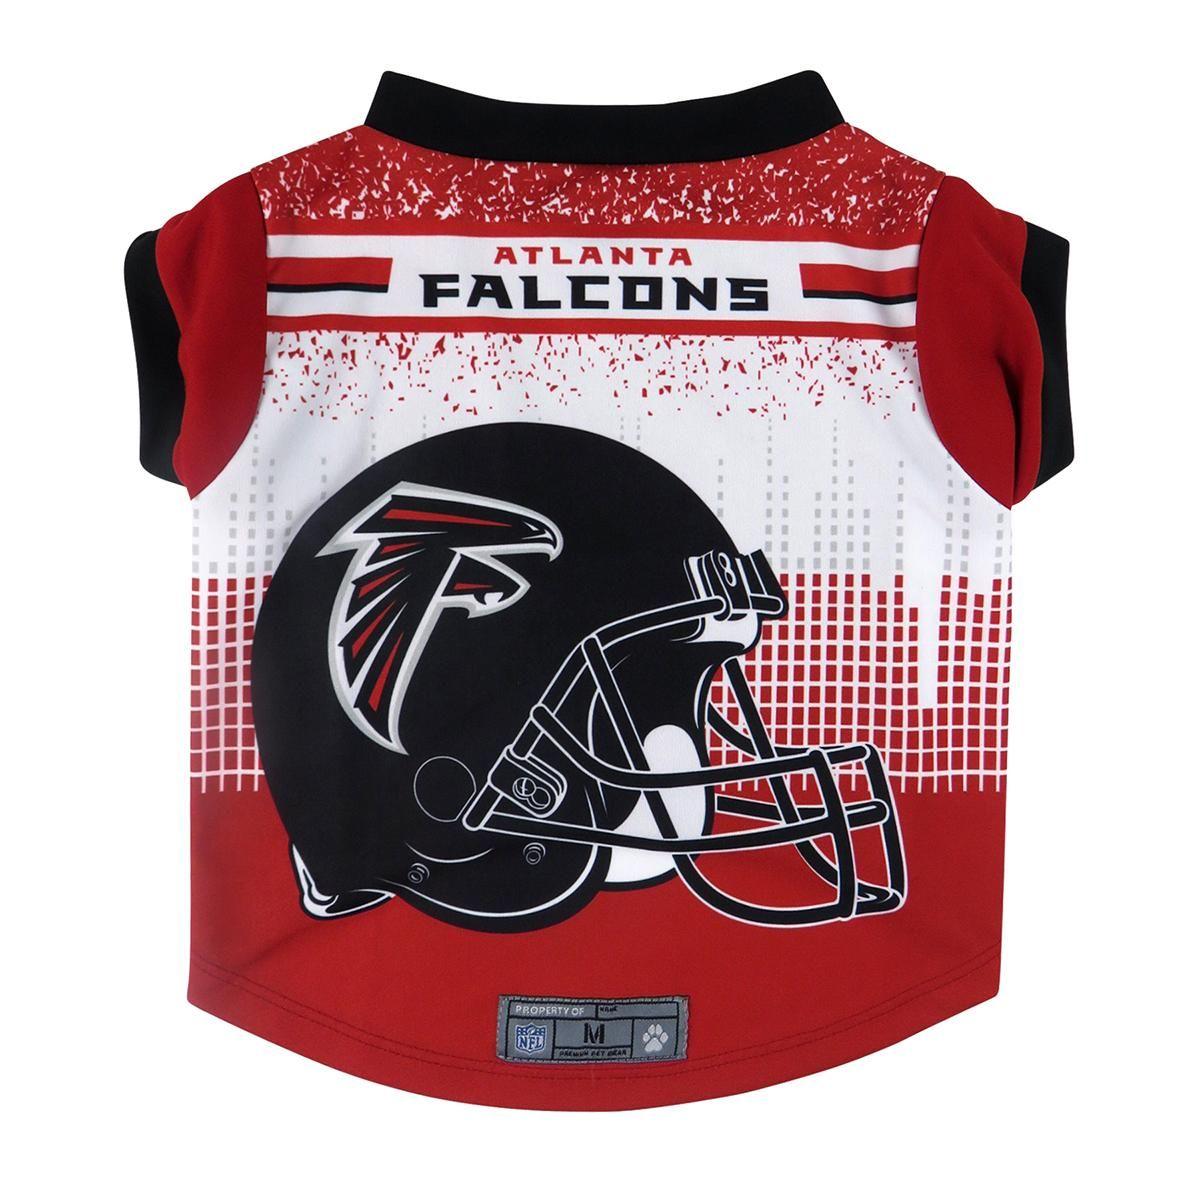 Atlanta Falcons Performance Dog Shirt Shirts Tee Shirts Atlanta Falcons